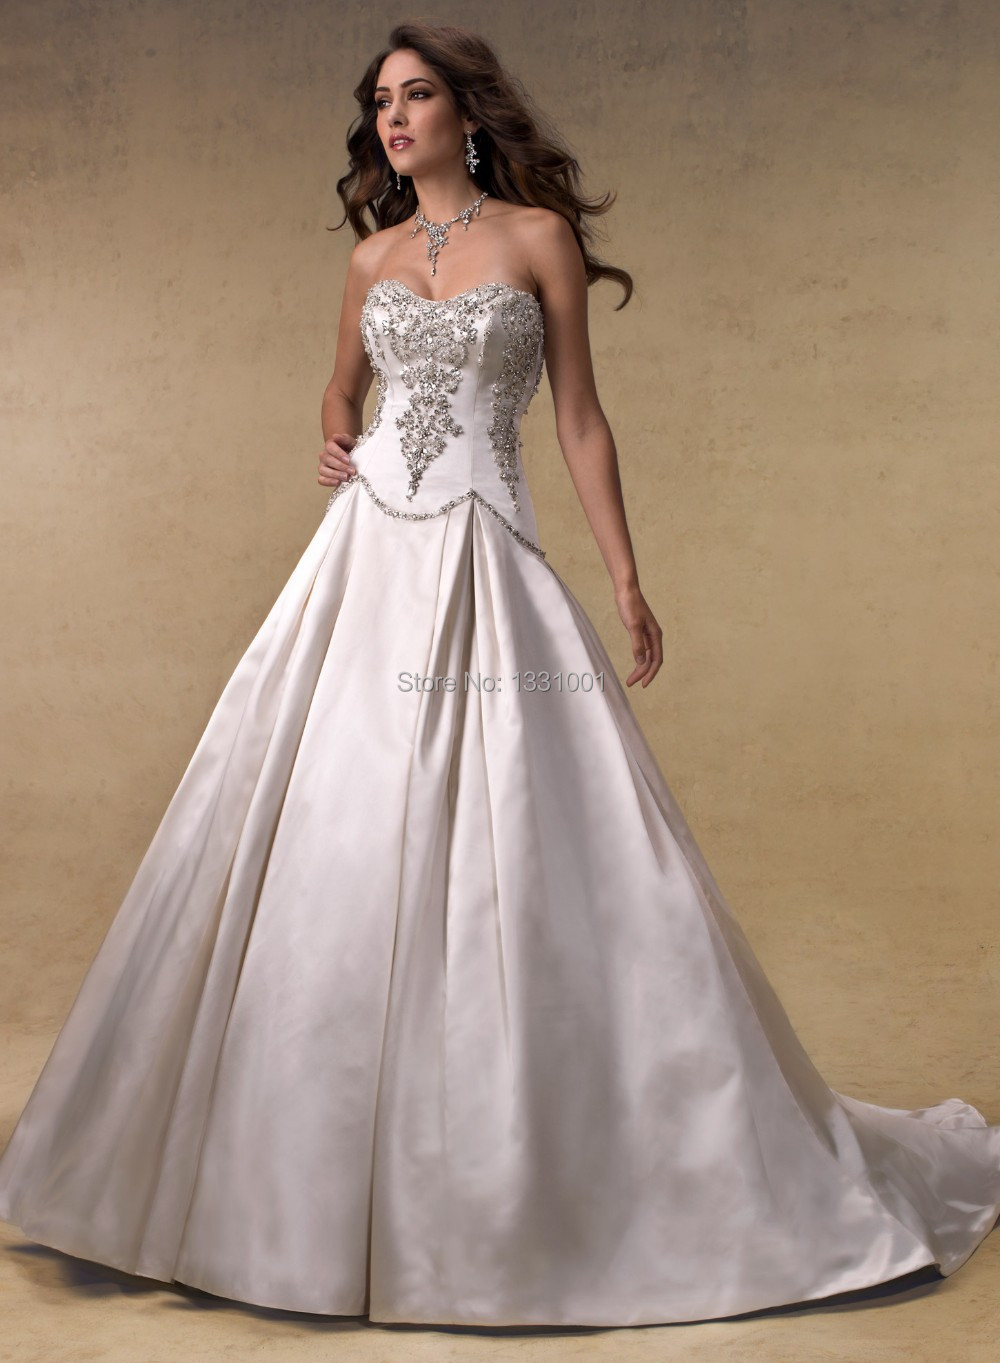 Online Get Cheap Purple White Wedding Dress -Aliexpress.com ...